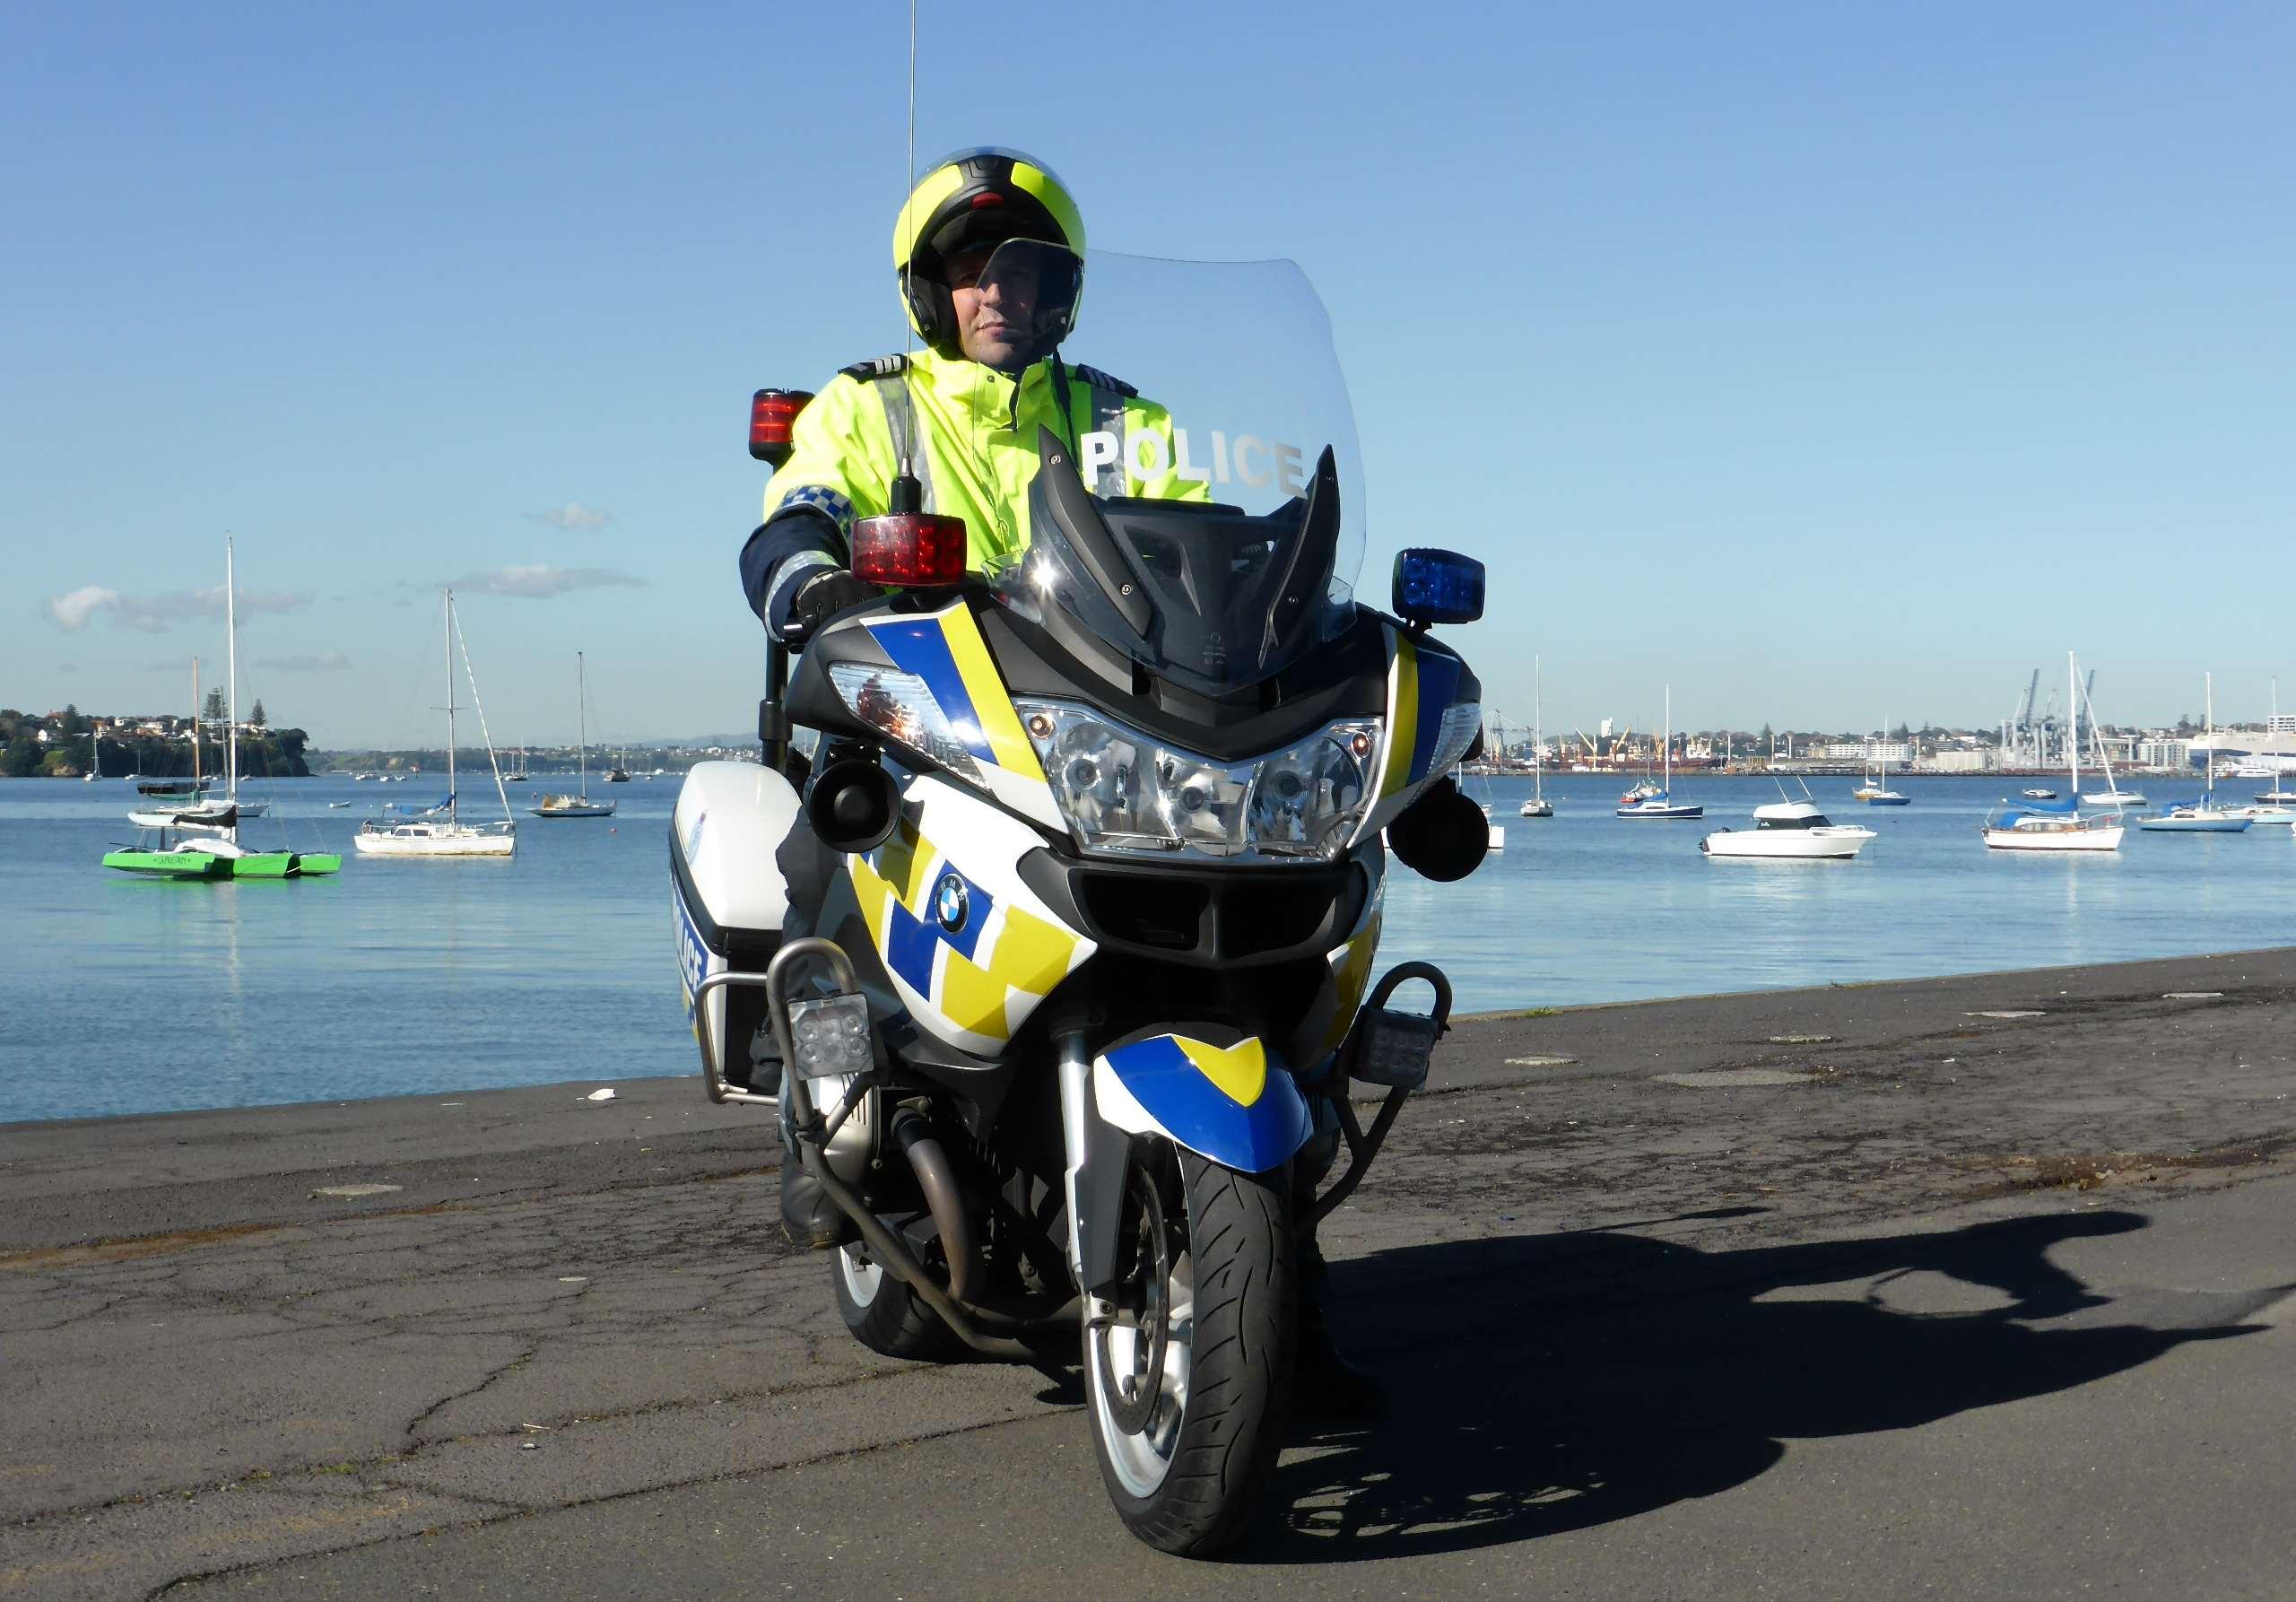 Best motorcycle gloves nz - Best Motorcycle Gloves Nz 26